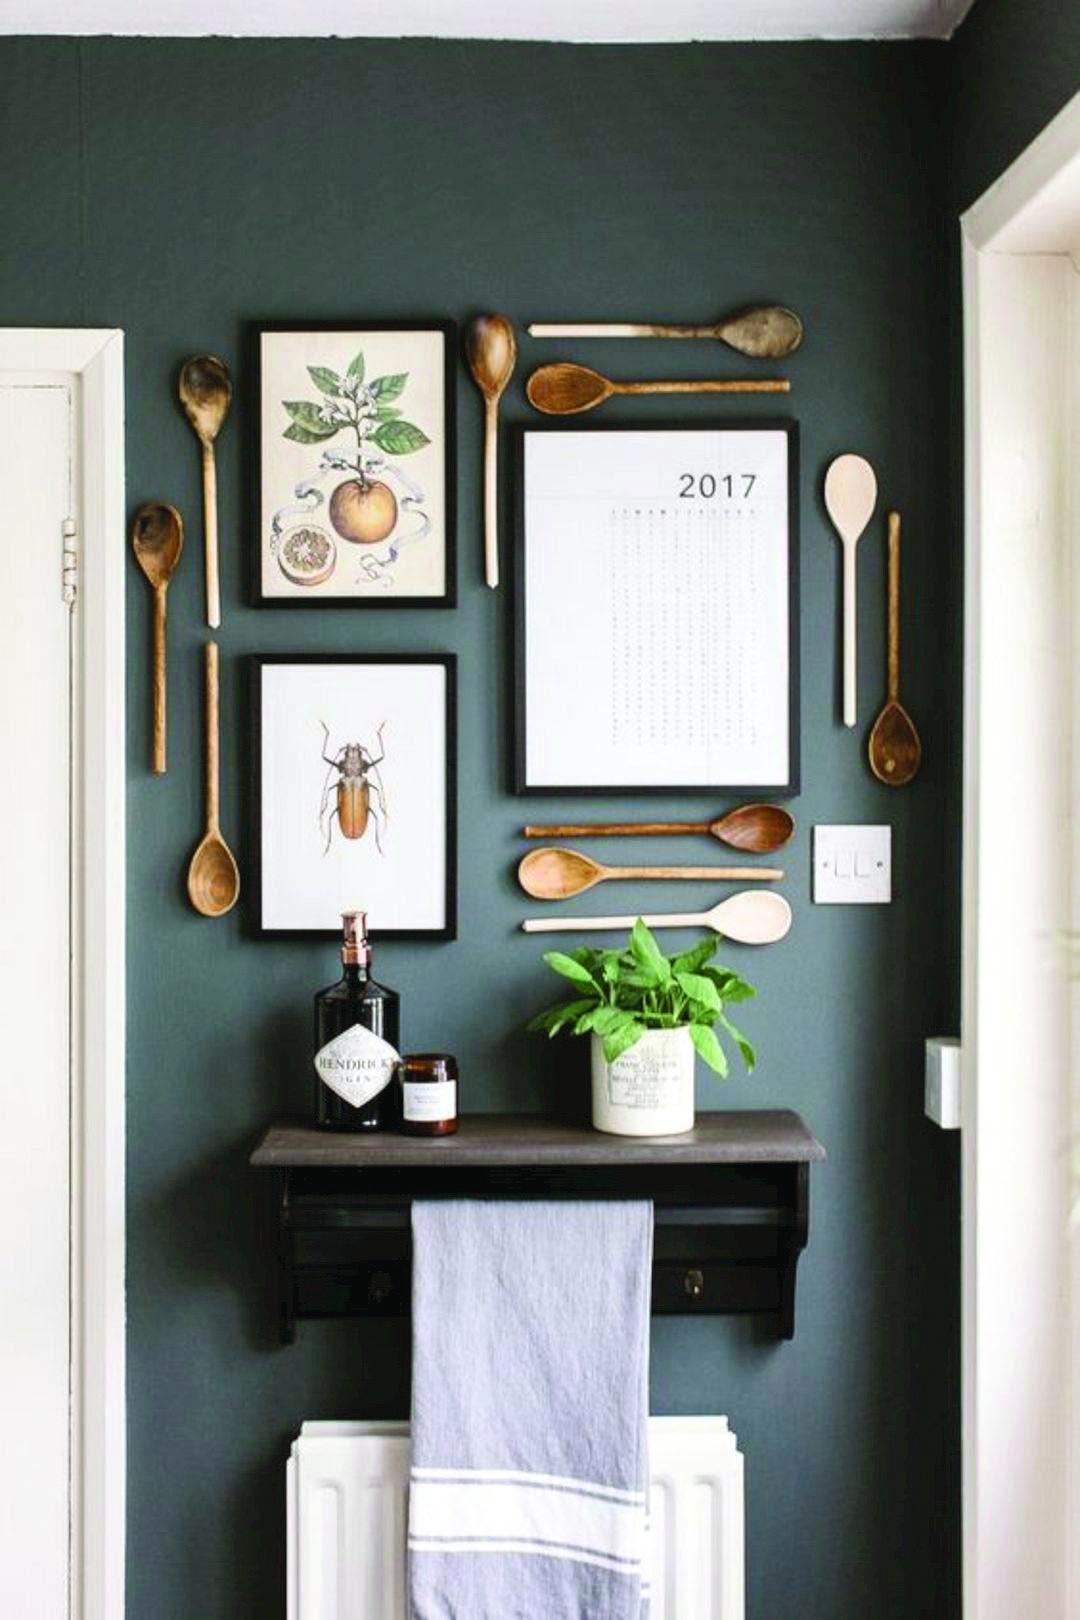 Vintage Kitchen Ideas Home Decor Kitchen Kitchen Wall Decor Home Decor